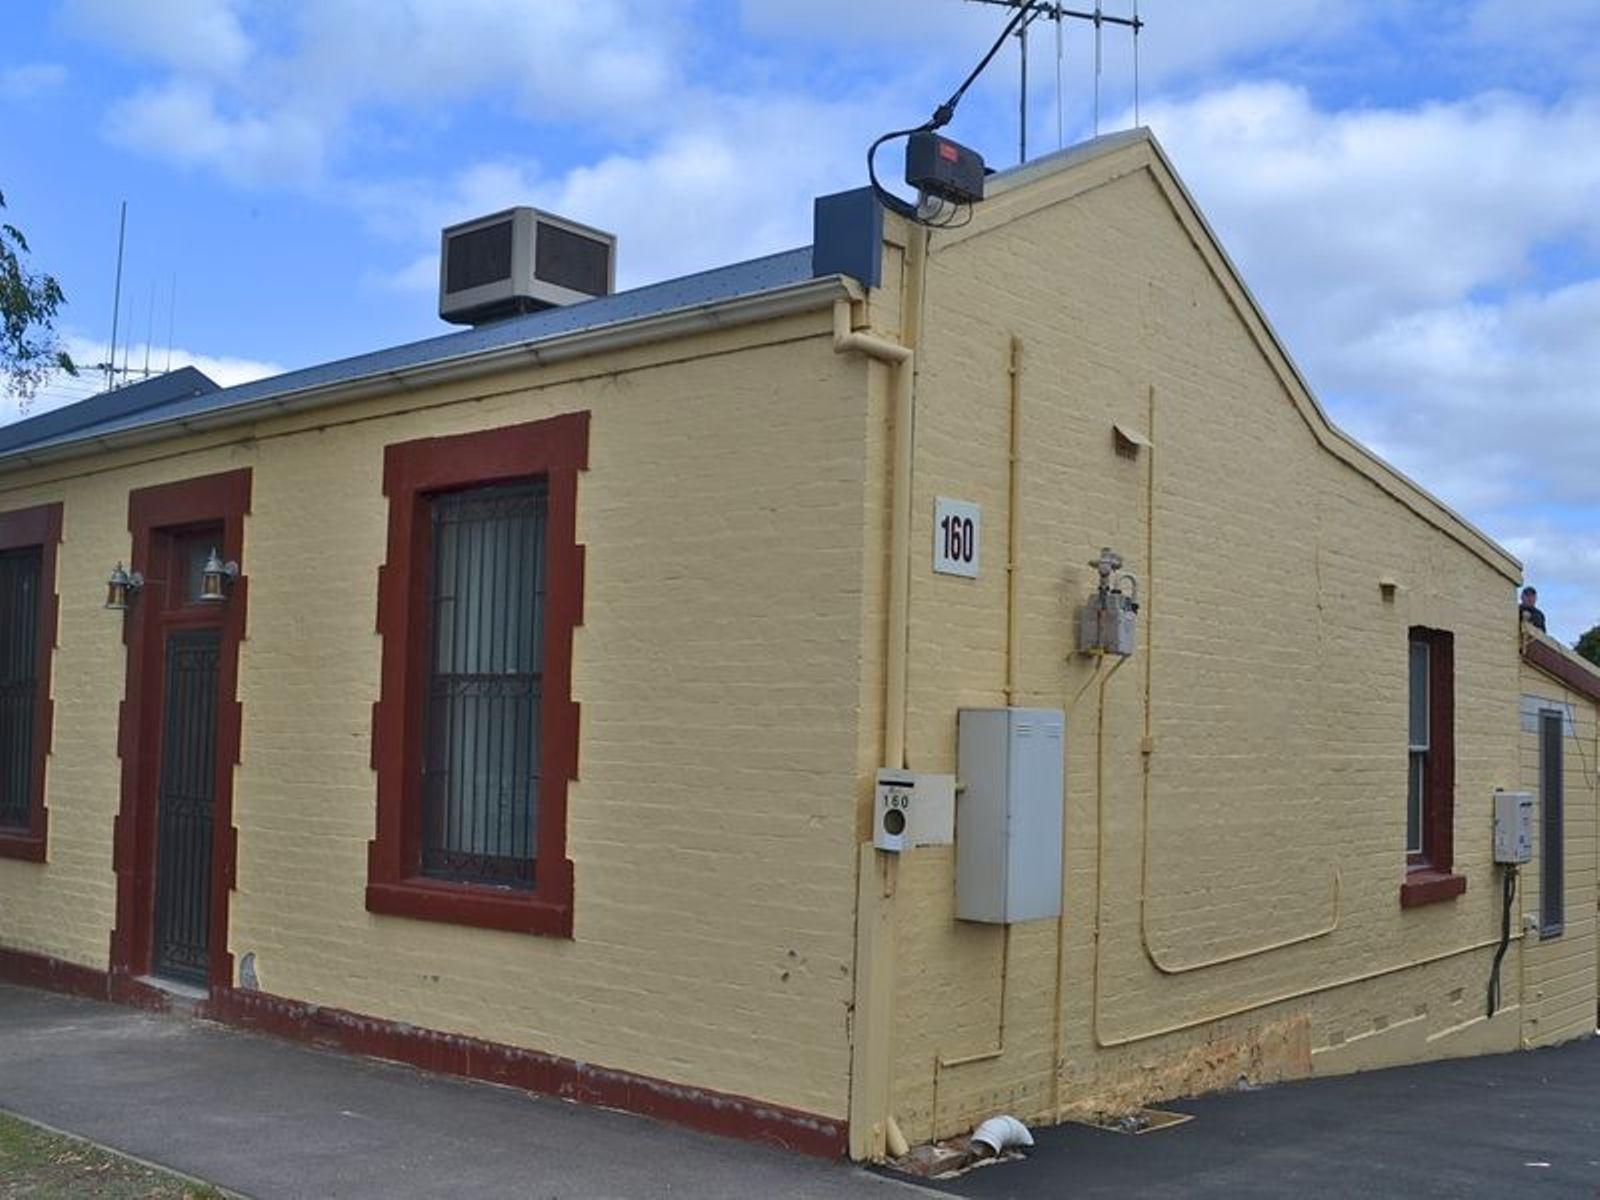 160 Queen Street, Bendigo, VIC 3550